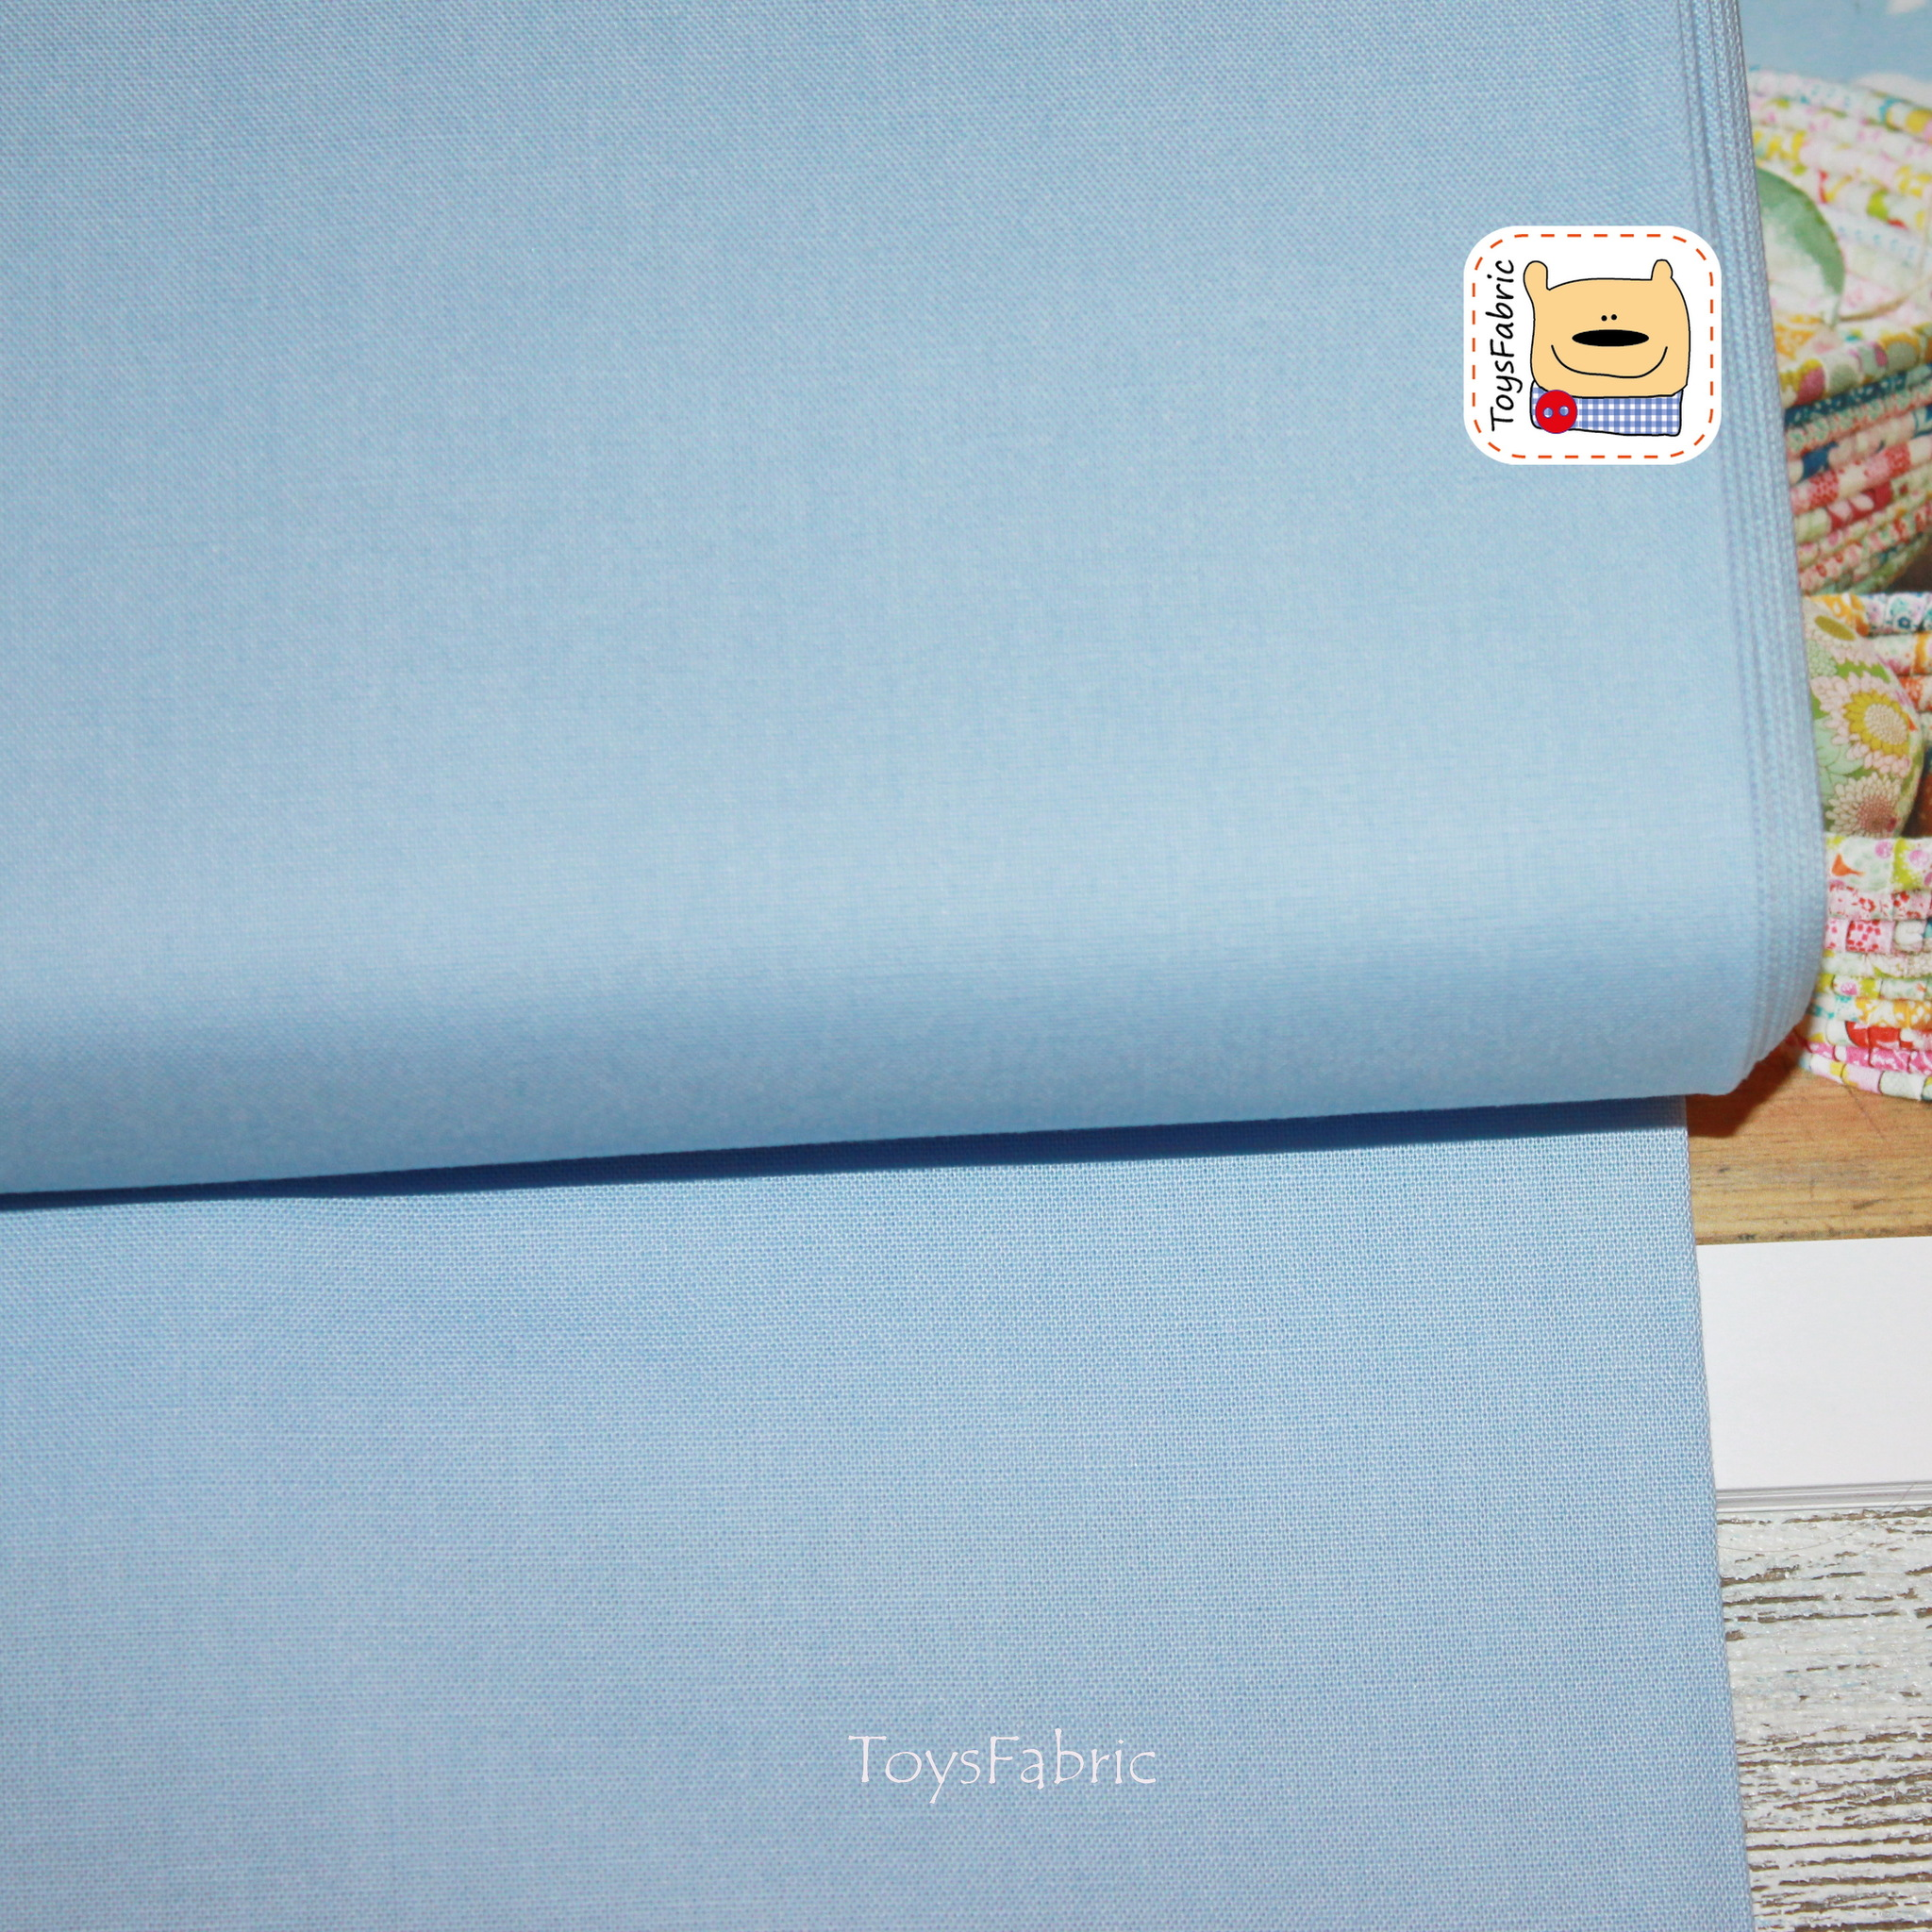 Ткань для пэчворка 20824 корейский хлопок (однотонный голубой) 45х55см